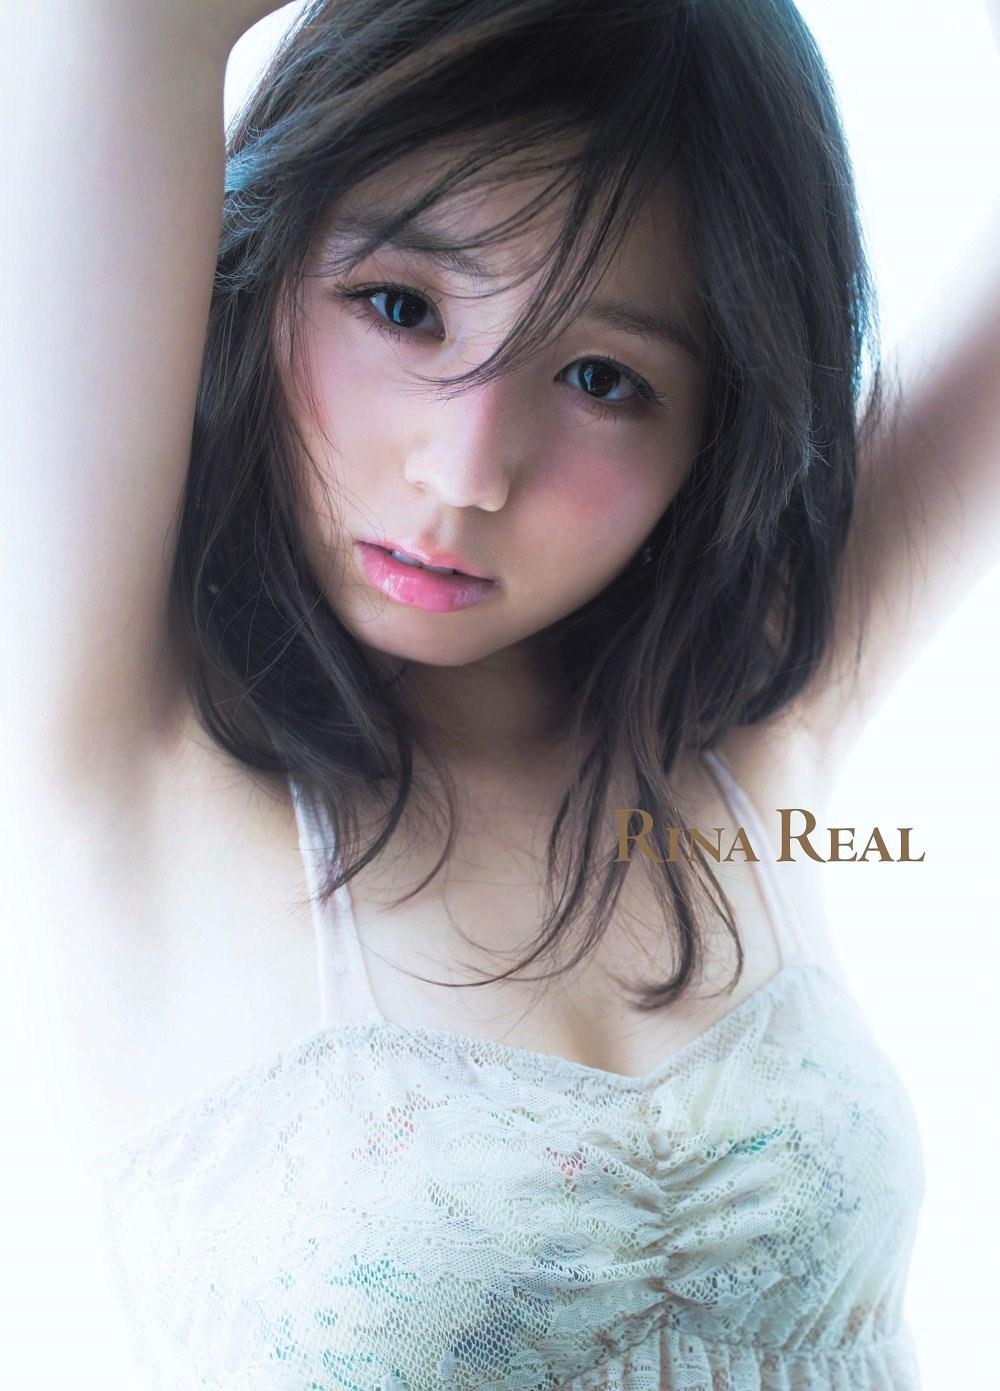 Rina Koike photobook RINA REAL standard edition